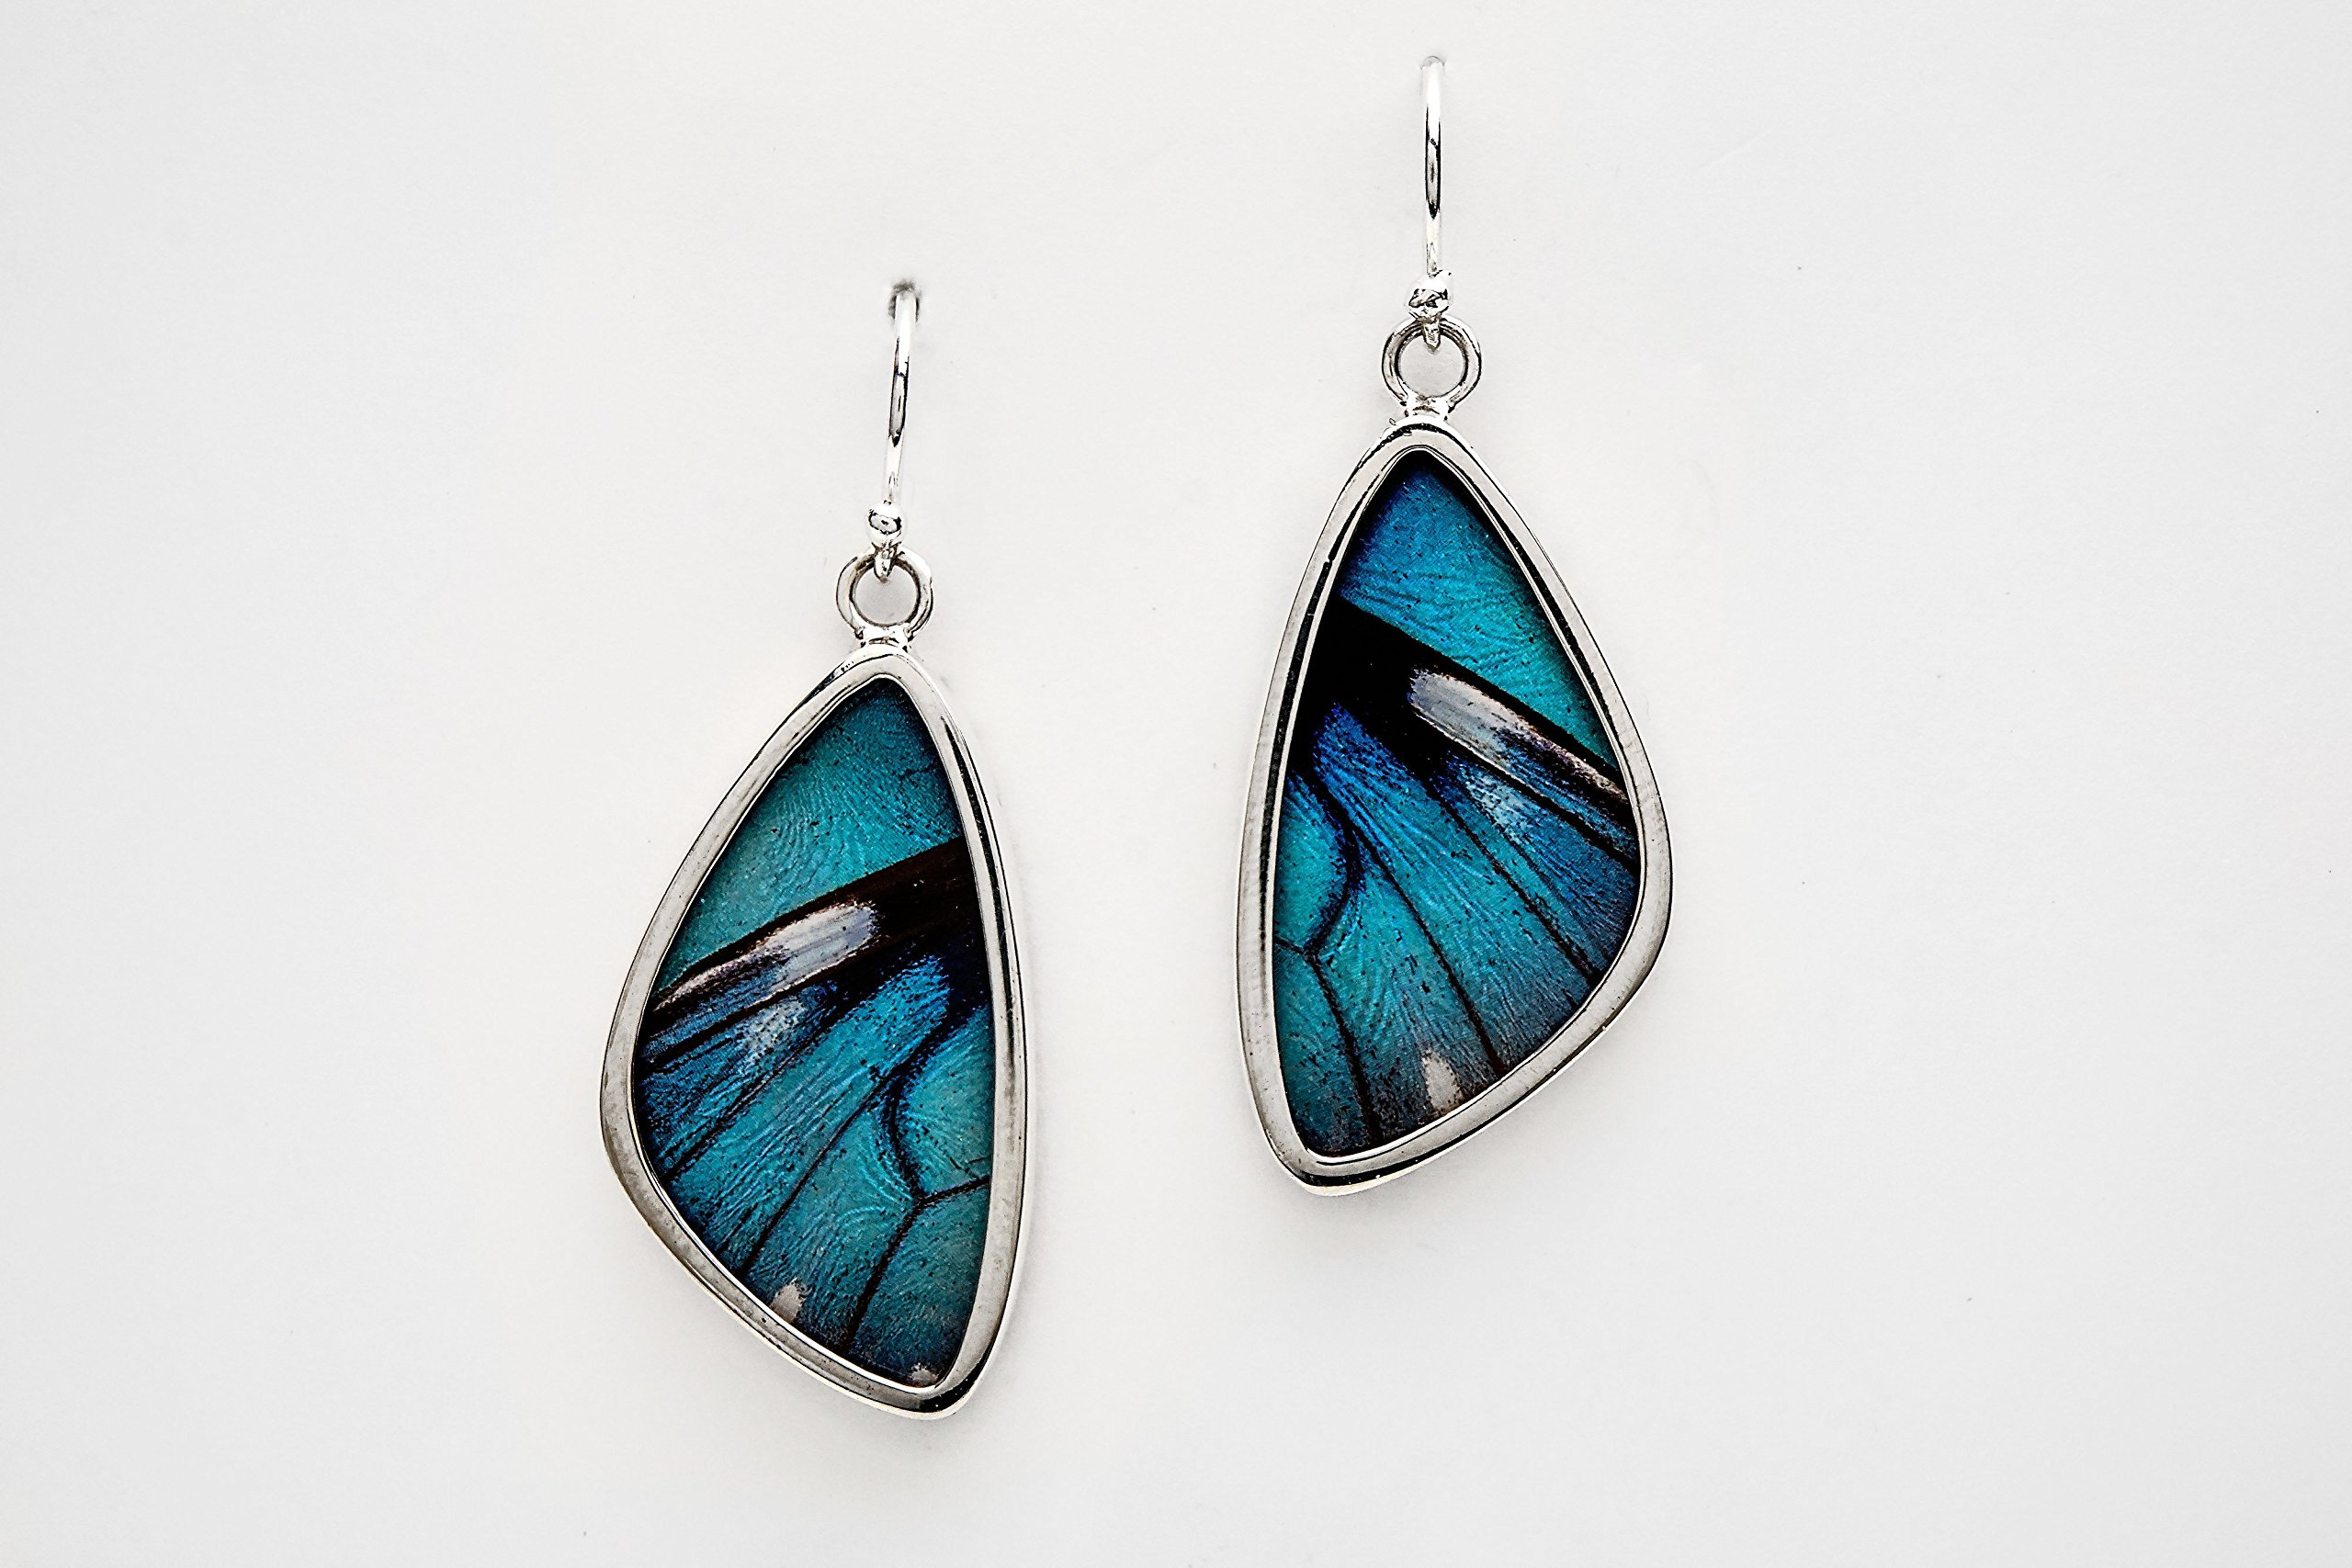 Real Butterfly Wing Earrings in Sterling Silver - Style #5